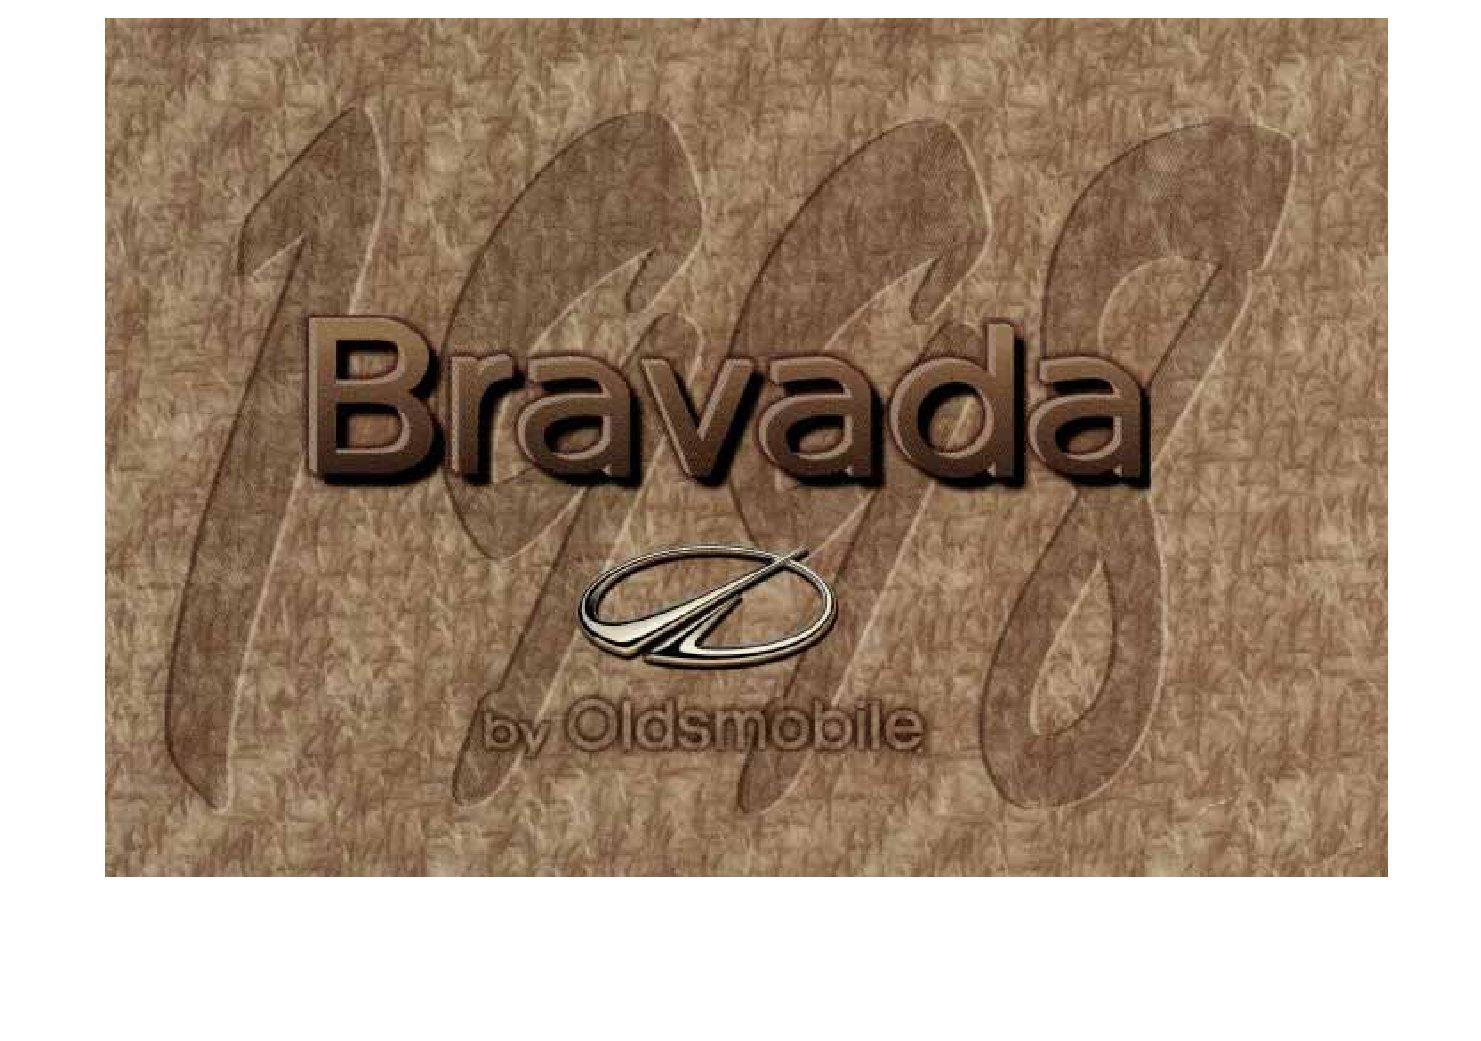 1998 oldsmobile bravada owners manual just give me the damn manual rh justgivemethedamnmanual com 2002 Oldsmobile Bravada 2001 Oldsmobile Bravada